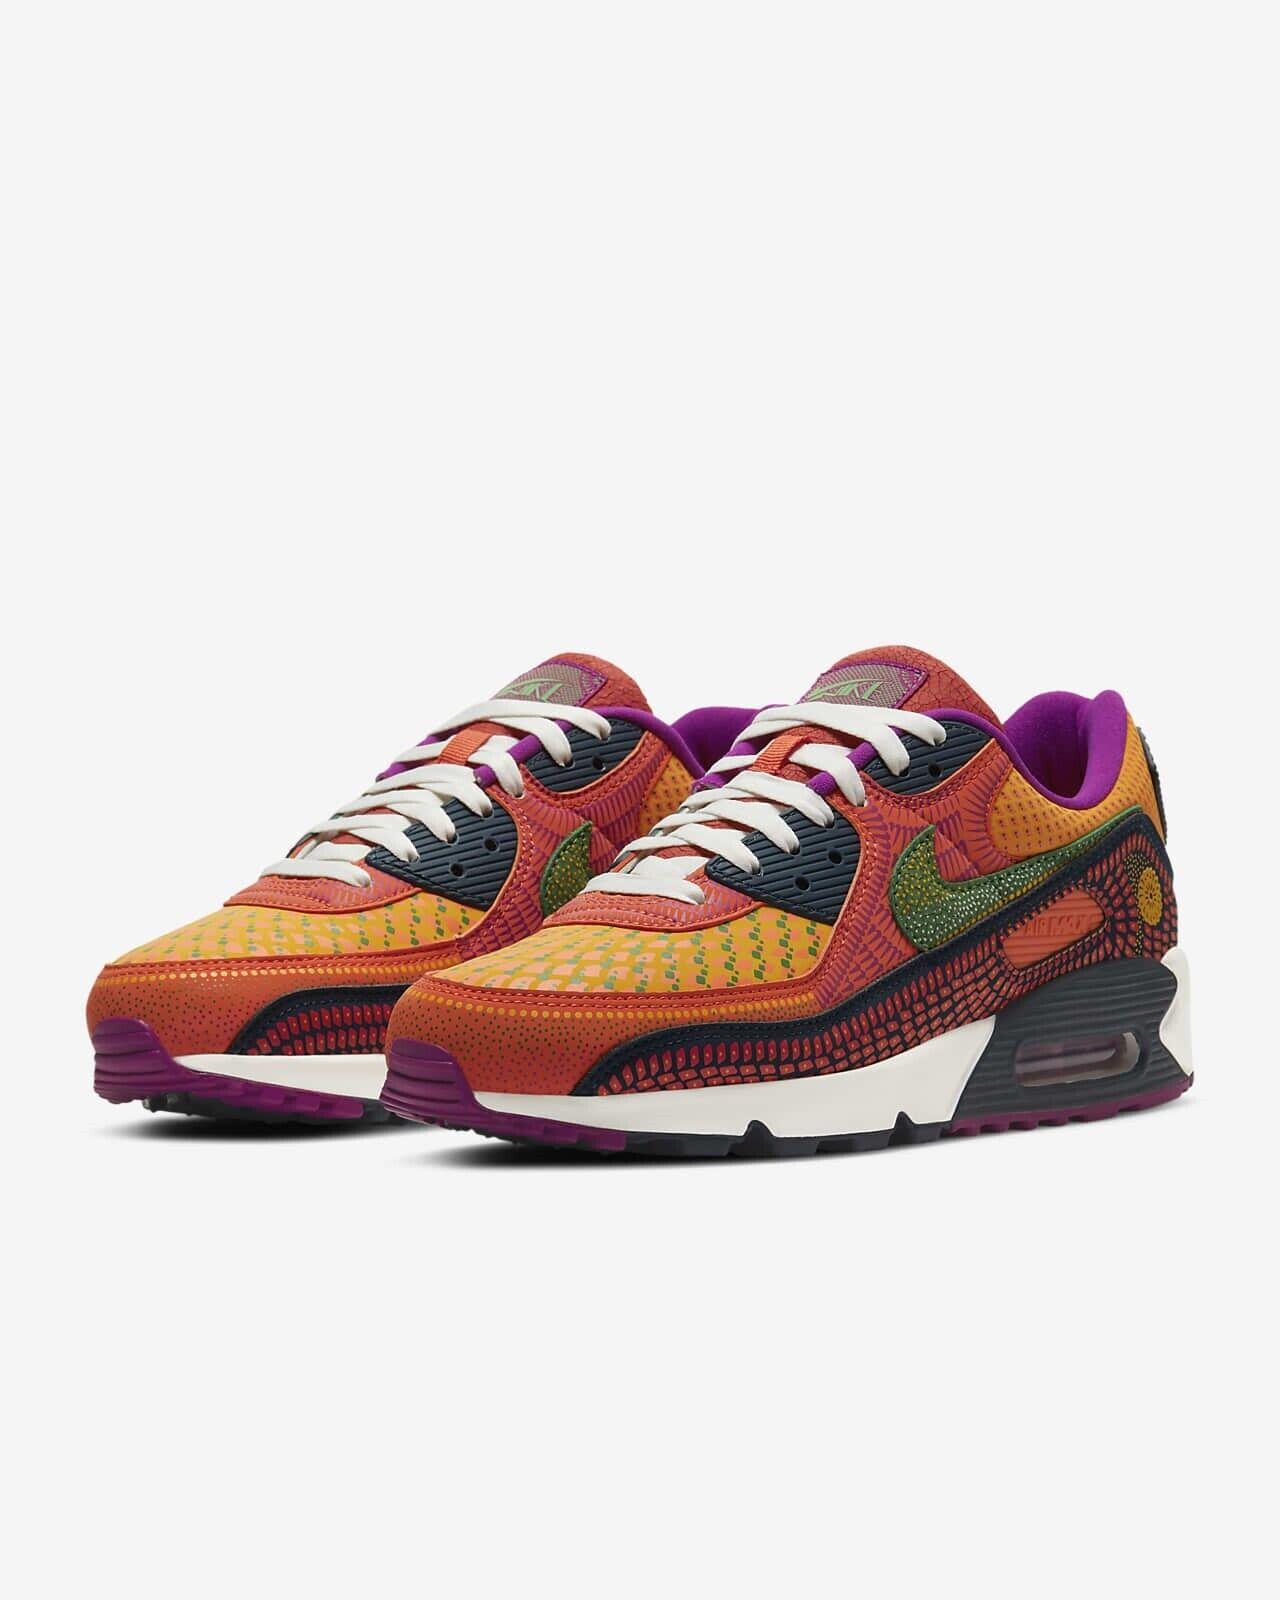 Size 9 - Nike Air Max 90 Día de Muertos 2020 for sale online   eBay